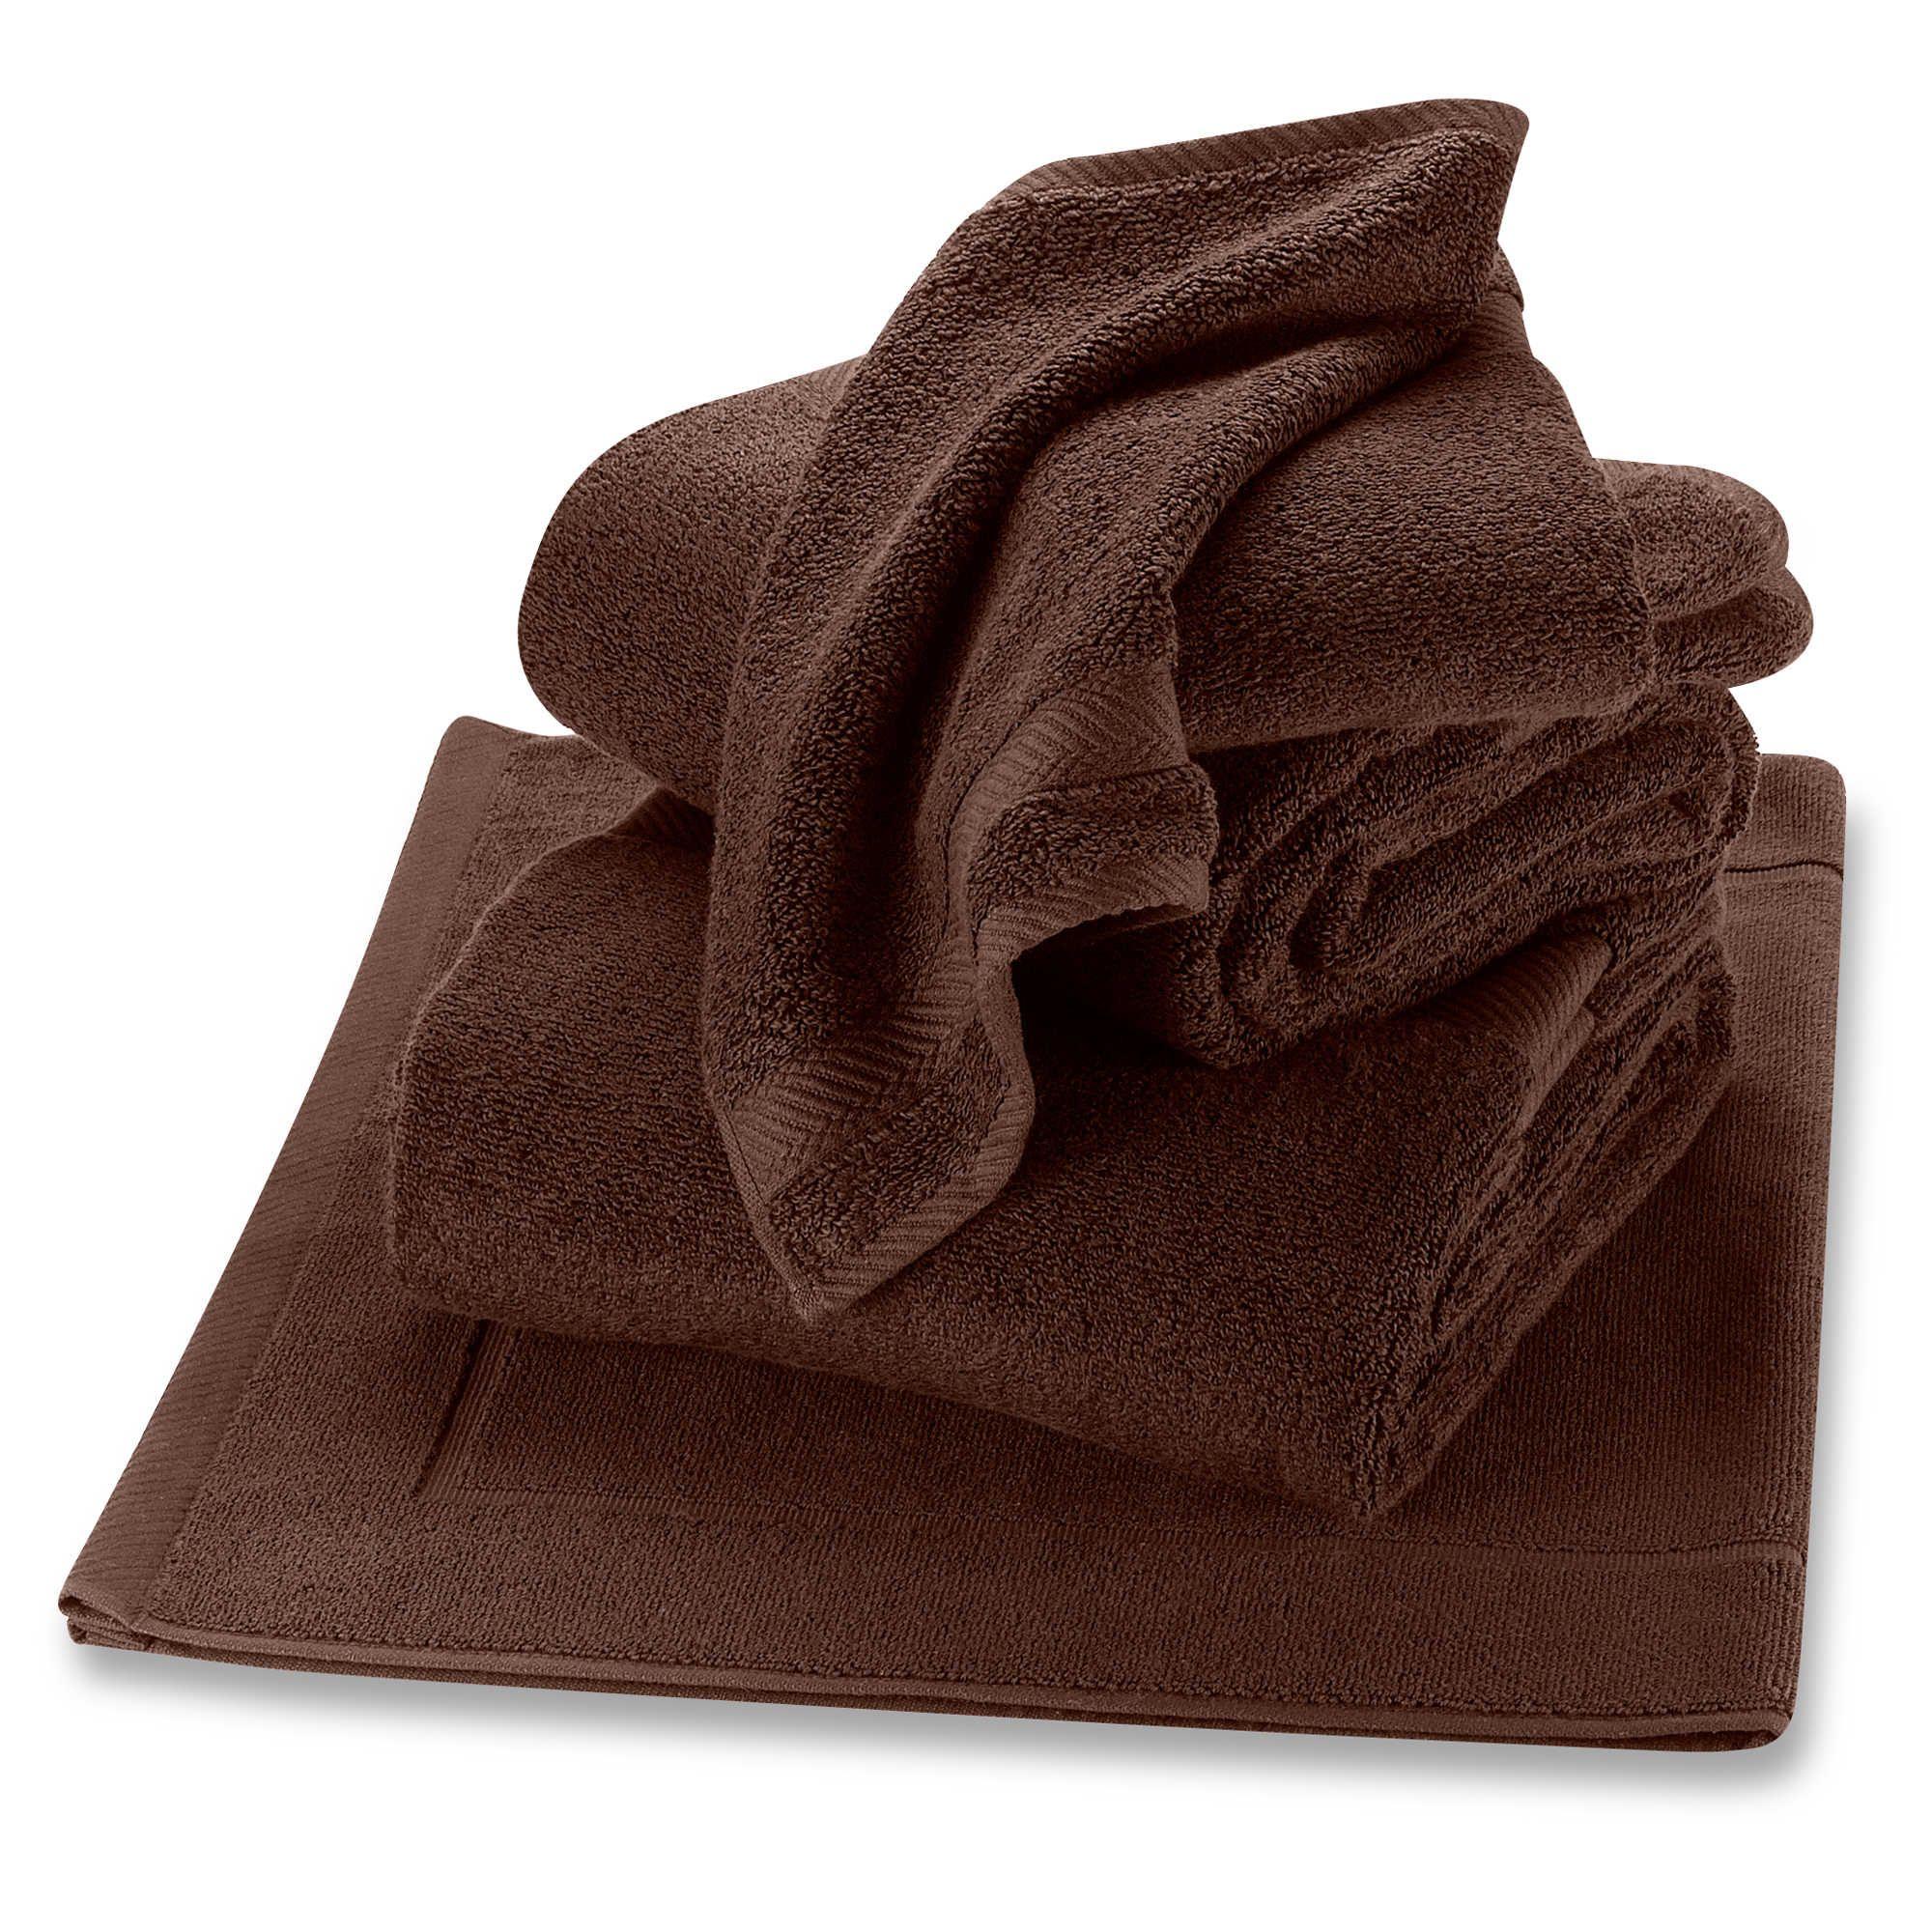 wamsutta duet bath sheet in java - Wamsutta Sheets